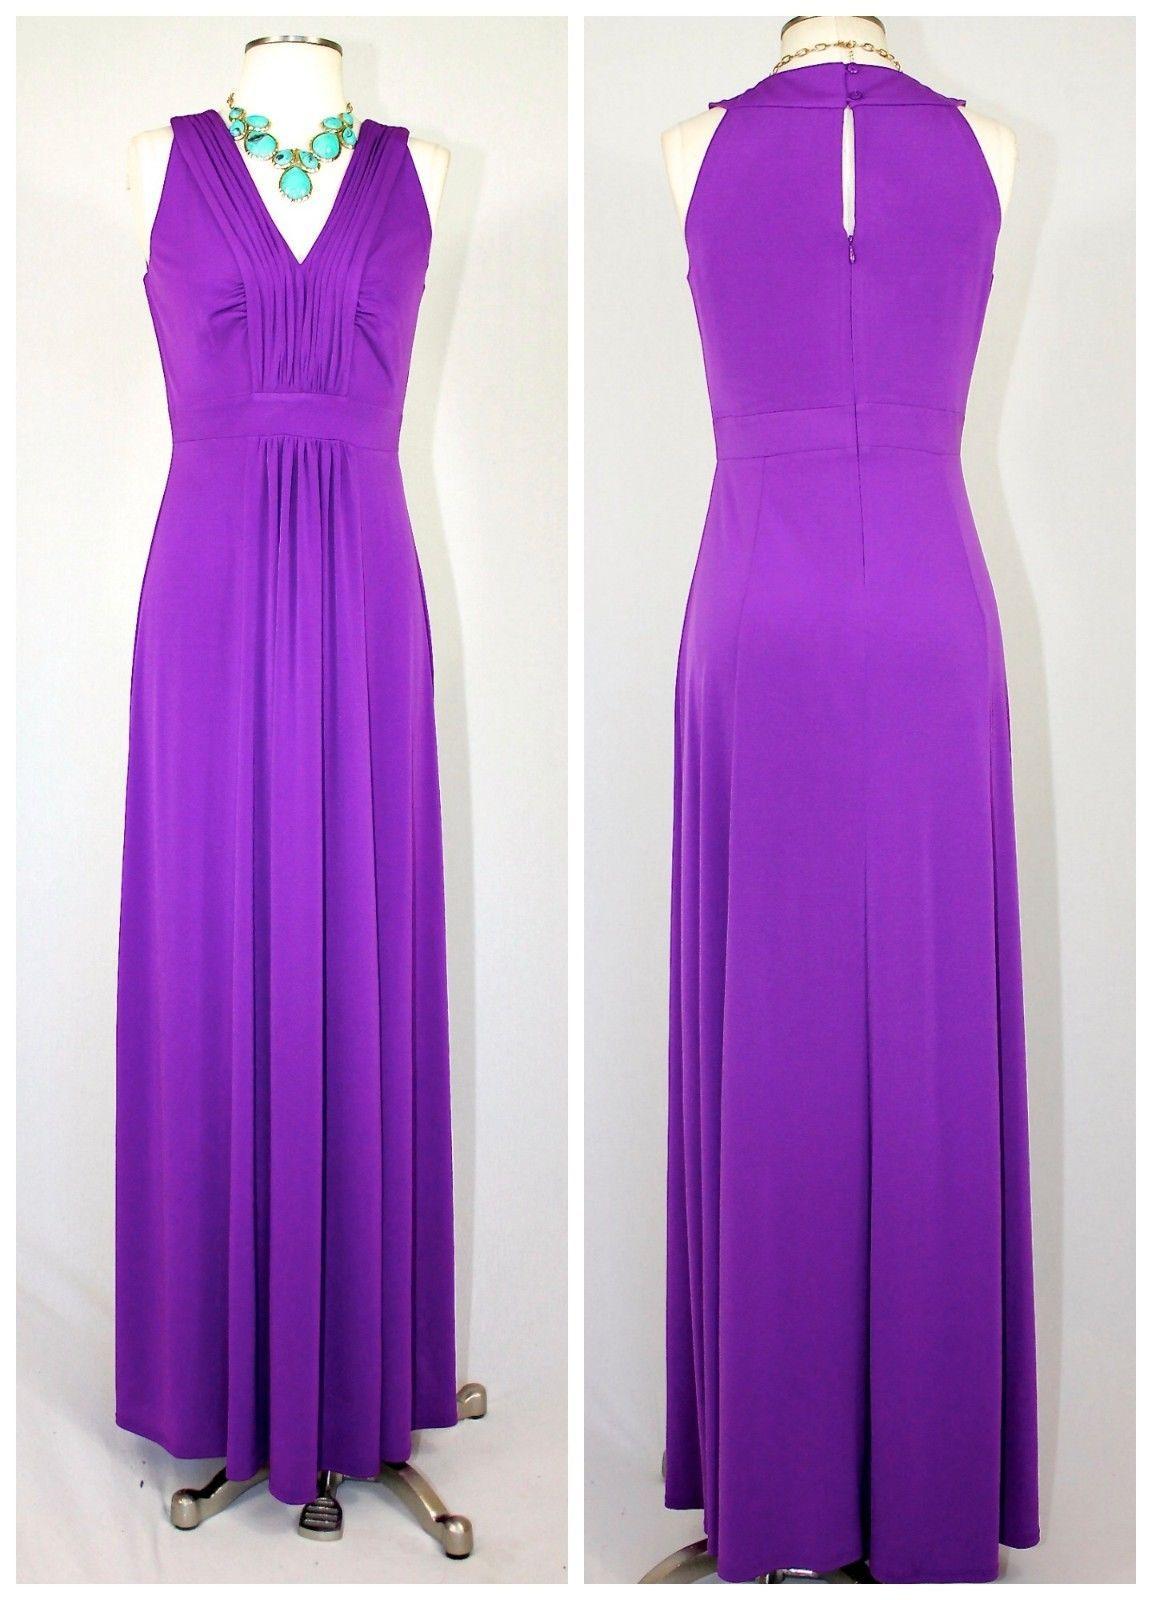 Sangria Amethyst Grape Elegant Flowing Maxi Dress Stein Mart Boutique Line 89 Ebay Boho Chic Outfits Flowing Maxi Dress Dresses [ 1600 x 1152 Pixel ]